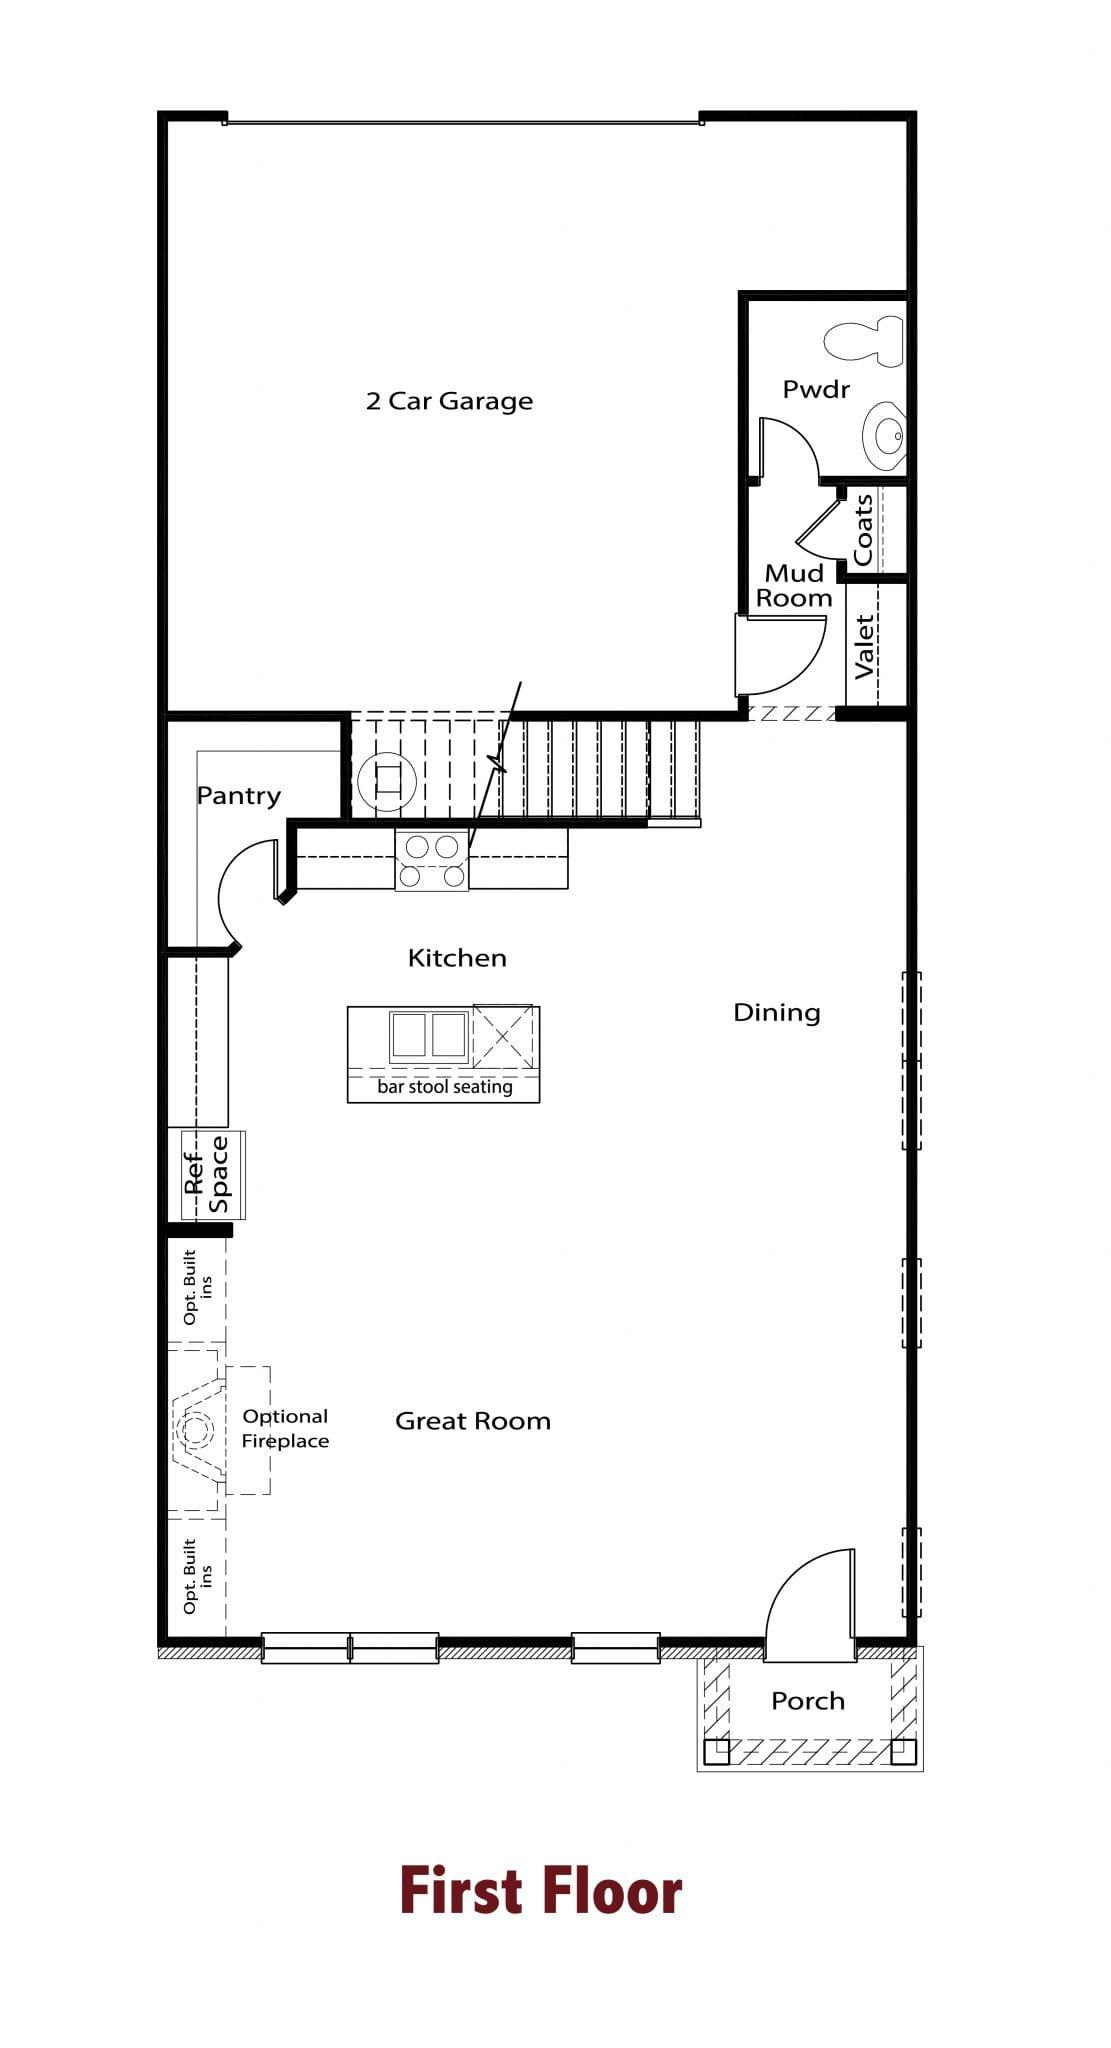 Meadows plans Image